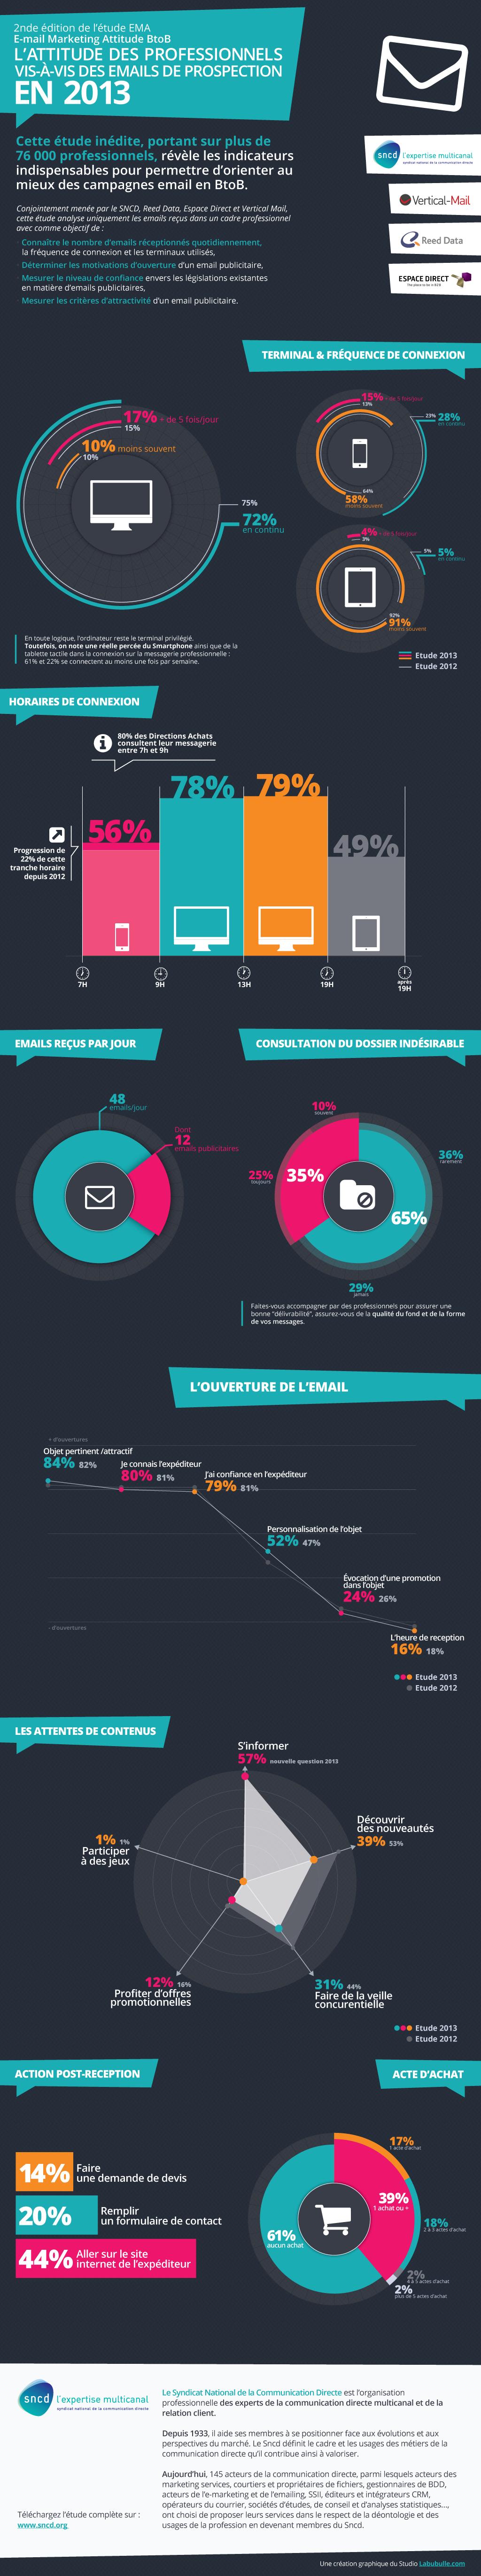 Infographie- Email Marketing Attitude B2B 2013